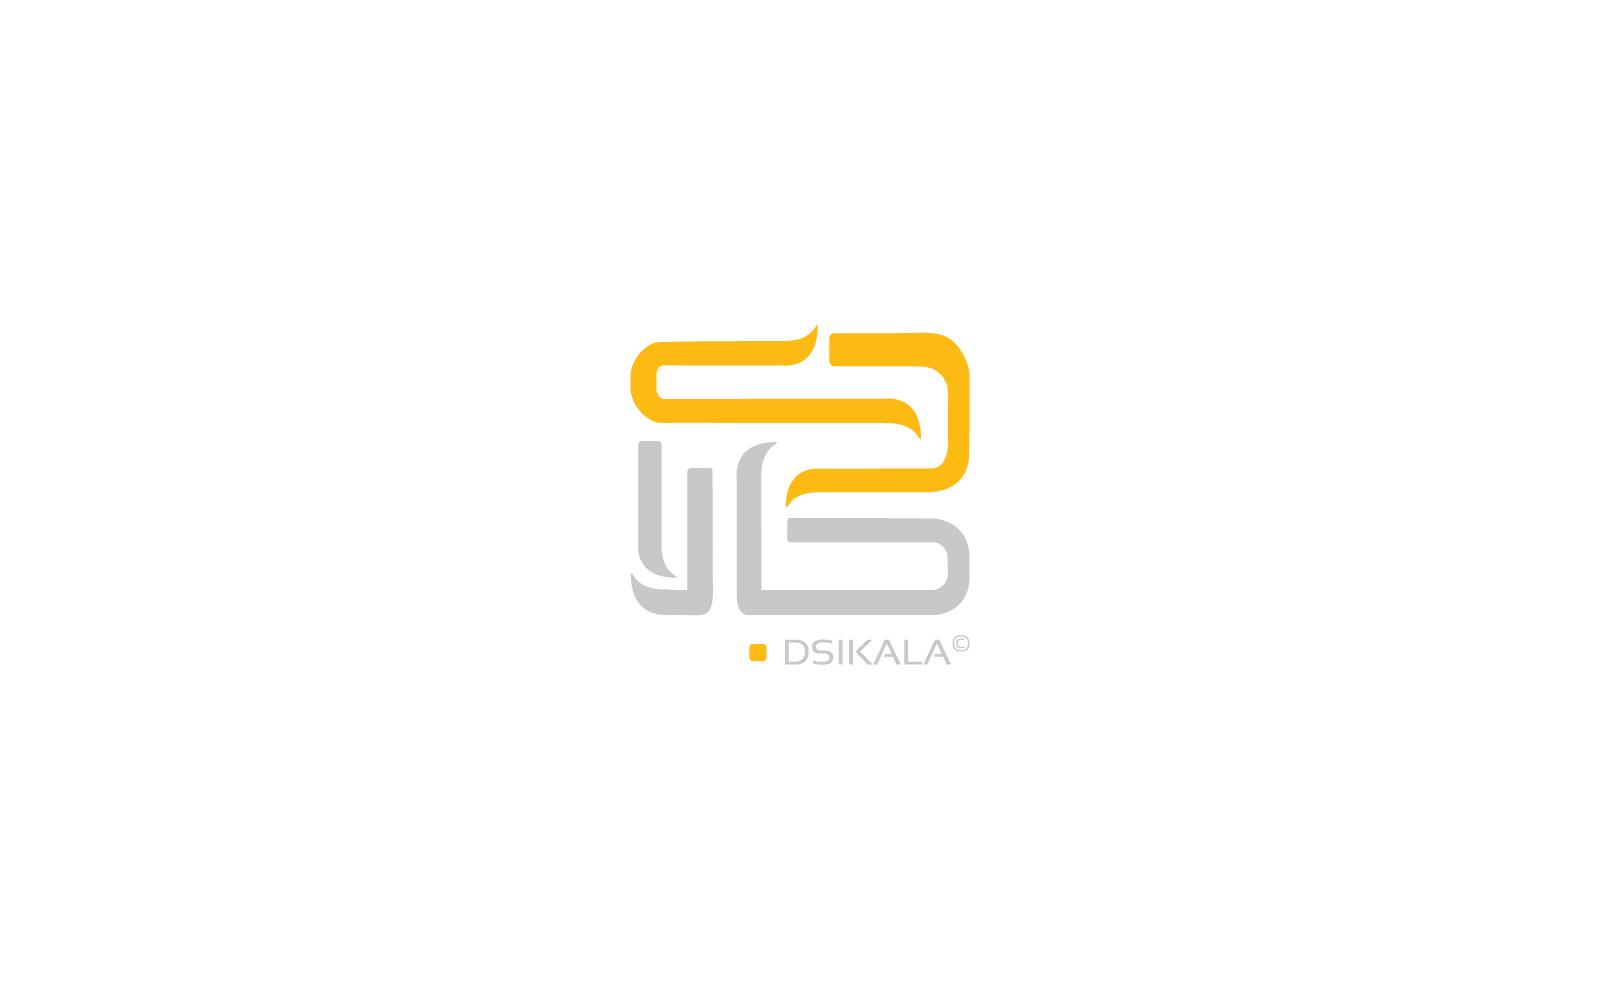 Dsikala- Add 7